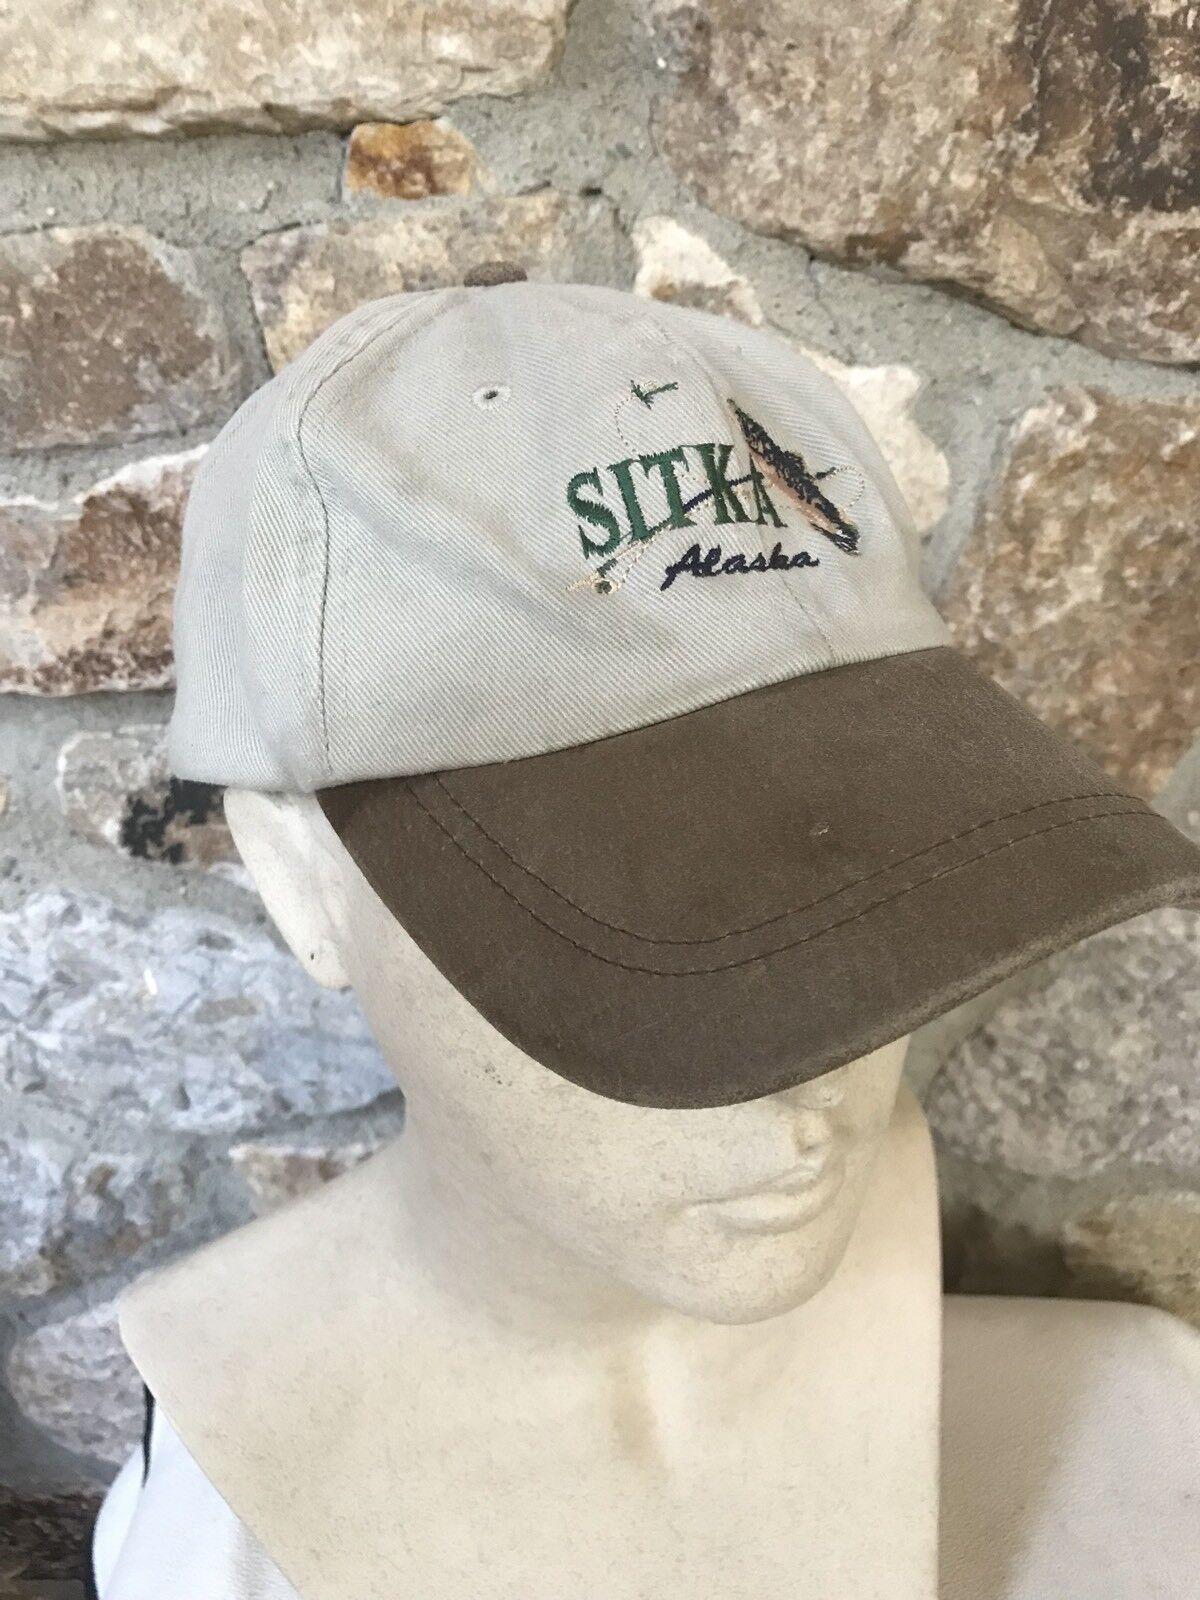 Vintage Dad SITKA ALASKA Leather Bill Baseball Cap Dad Vintage Hat Salmon Fly Fishing 54a3ae